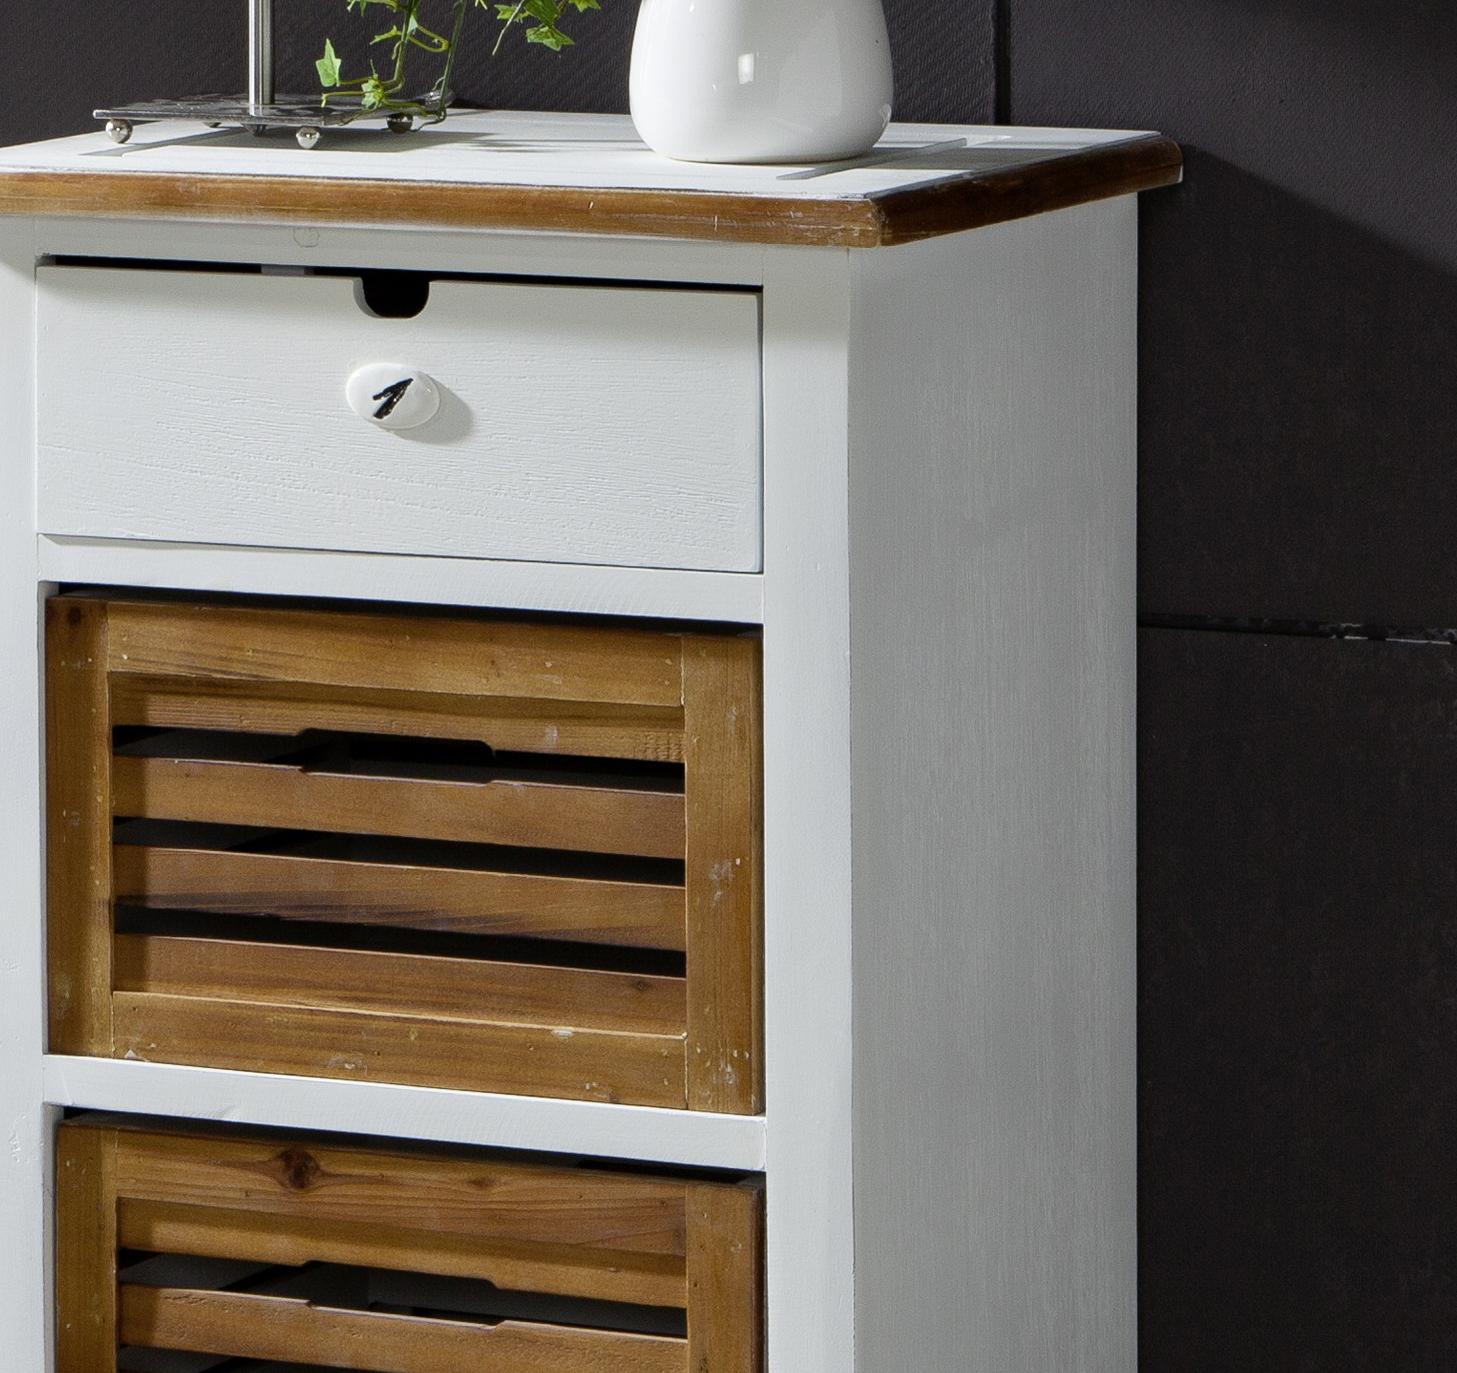 sam beistellschrank i wei lackiert paulowniaholz paris 433. Black Bedroom Furniture Sets. Home Design Ideas